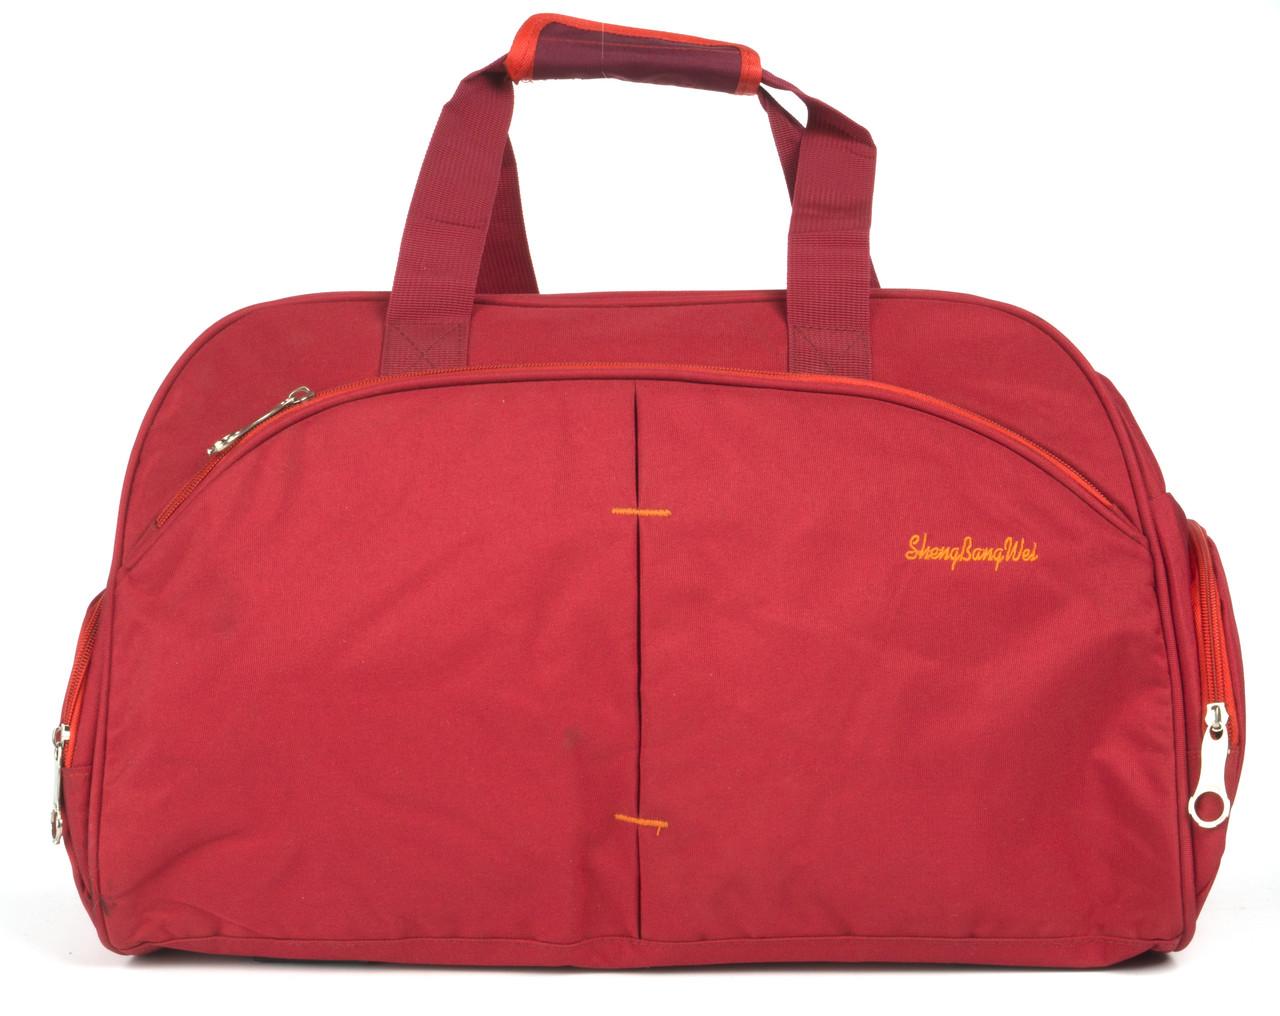 Стильная прочная спортивная сумка ShengBangWei art. 8091-2 красная